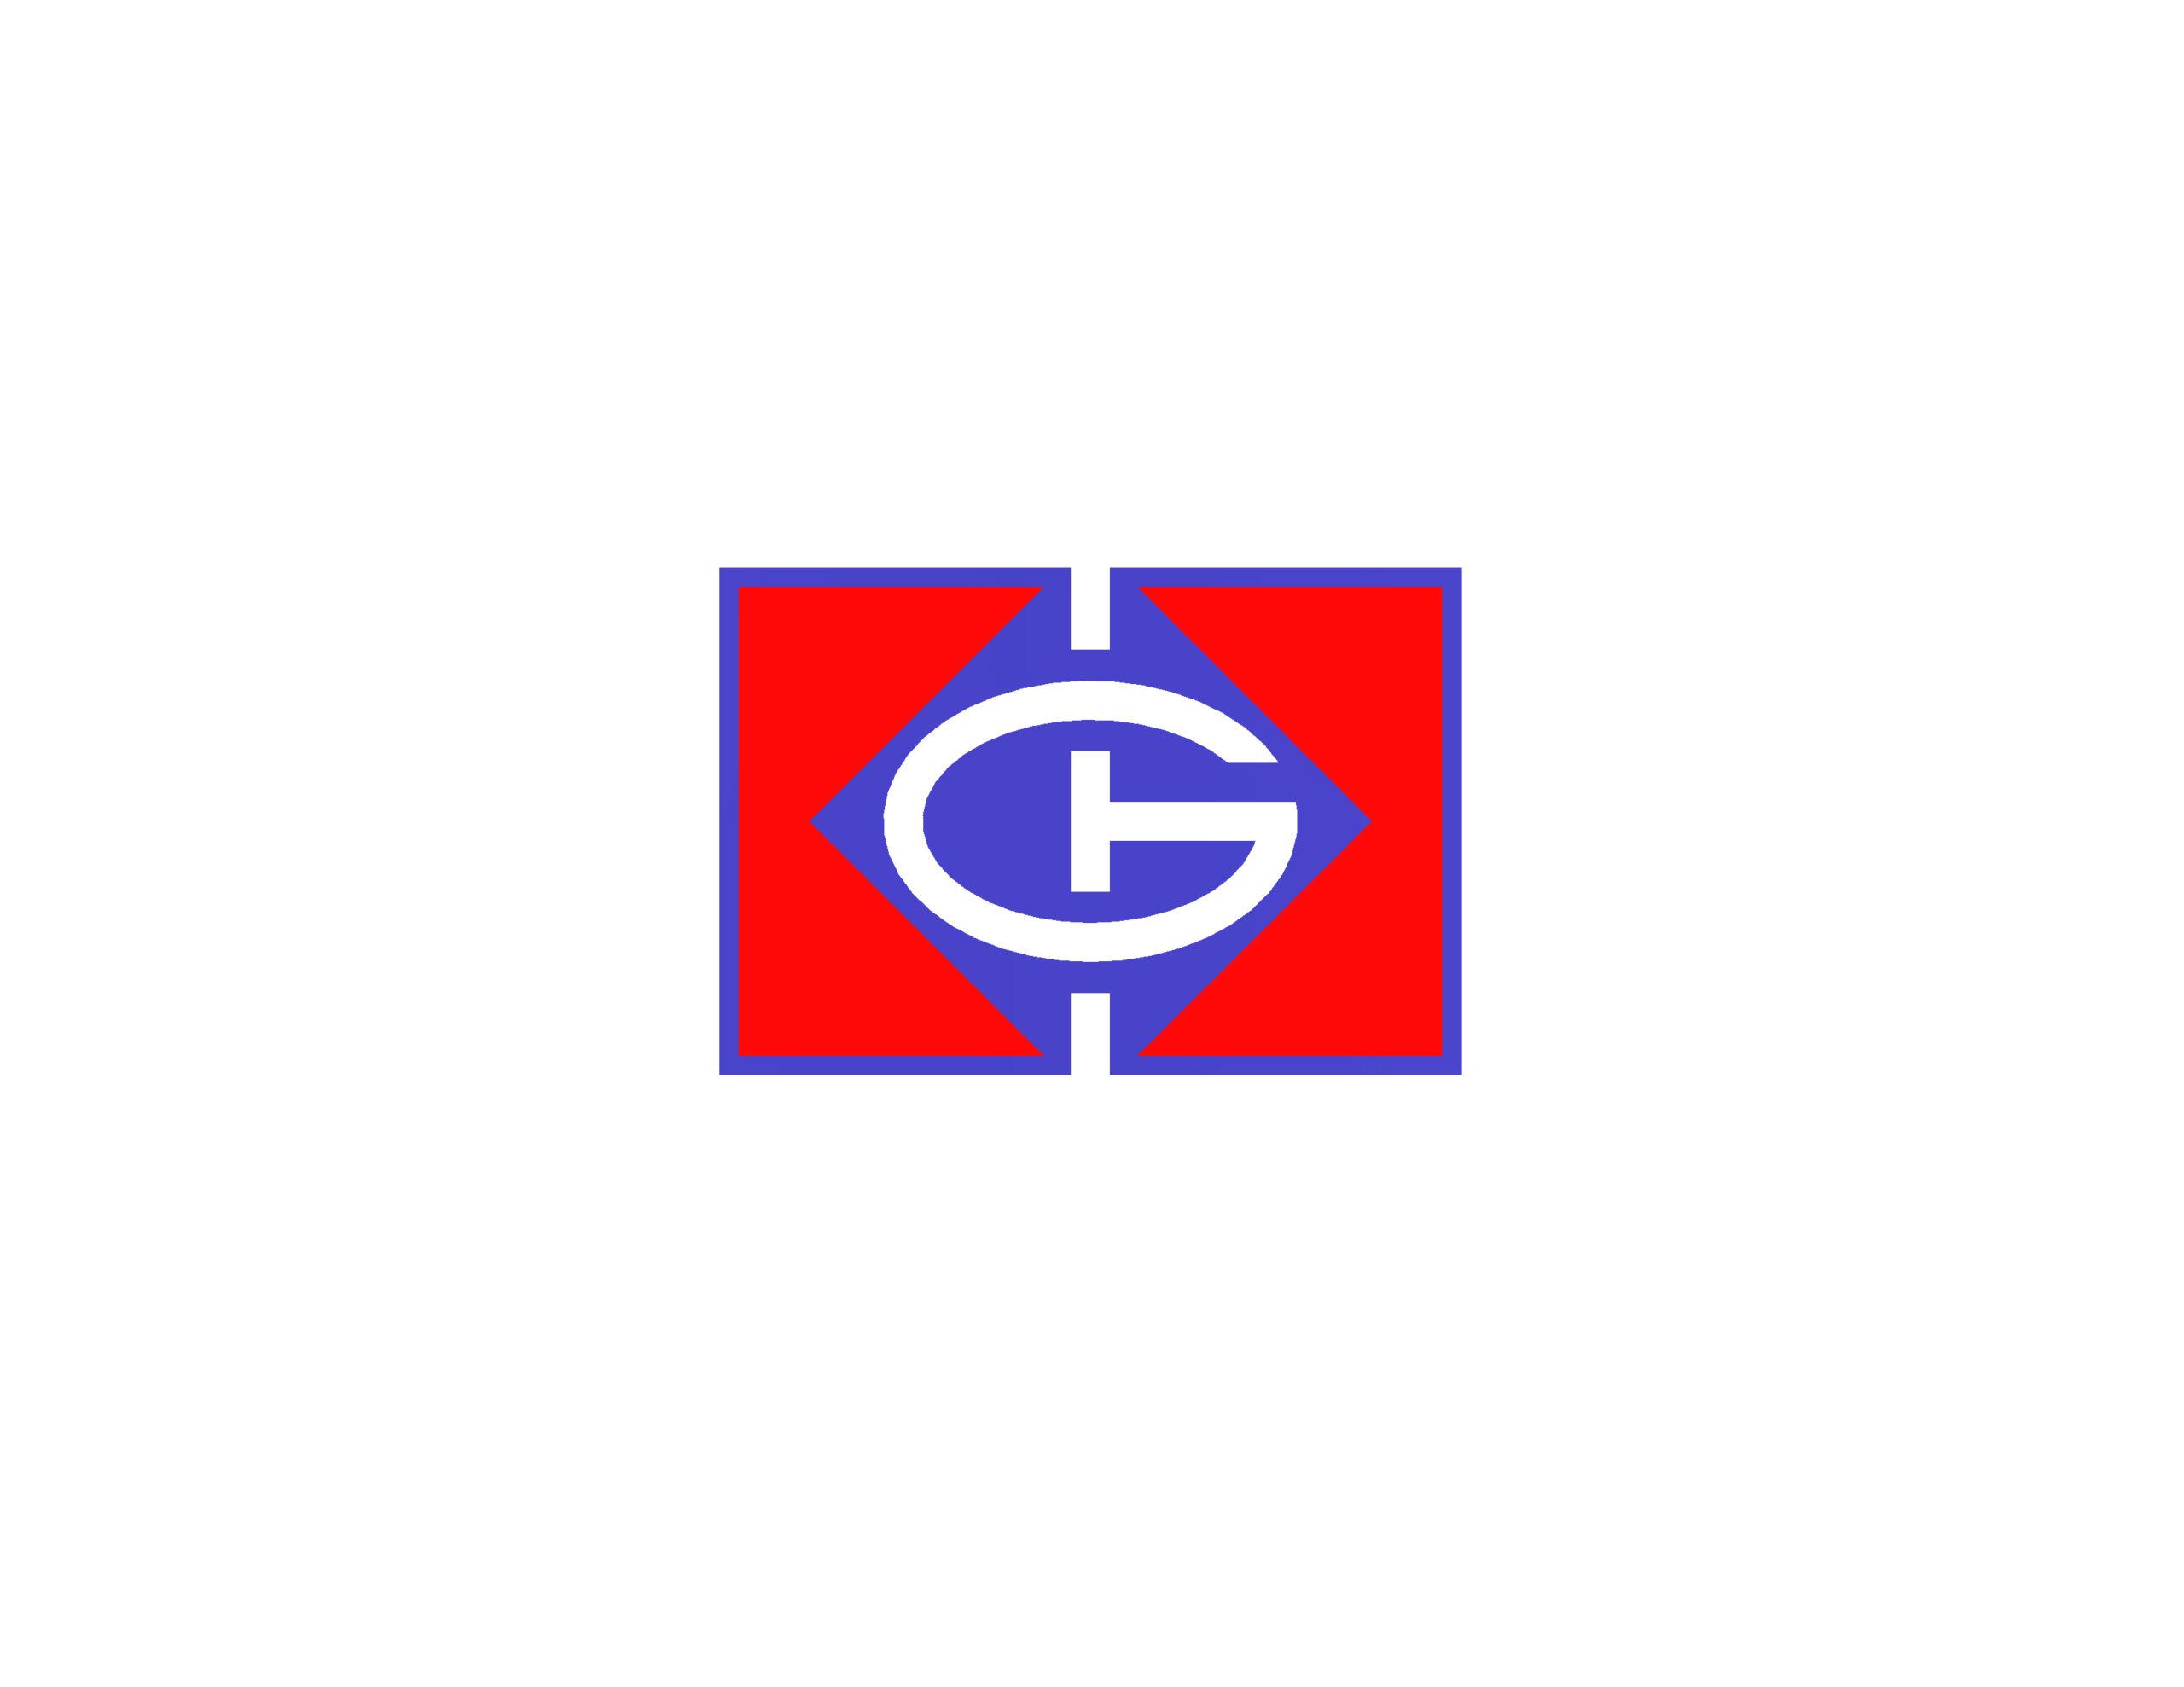 Christian Gospel Church Toronto (CGCT) logo